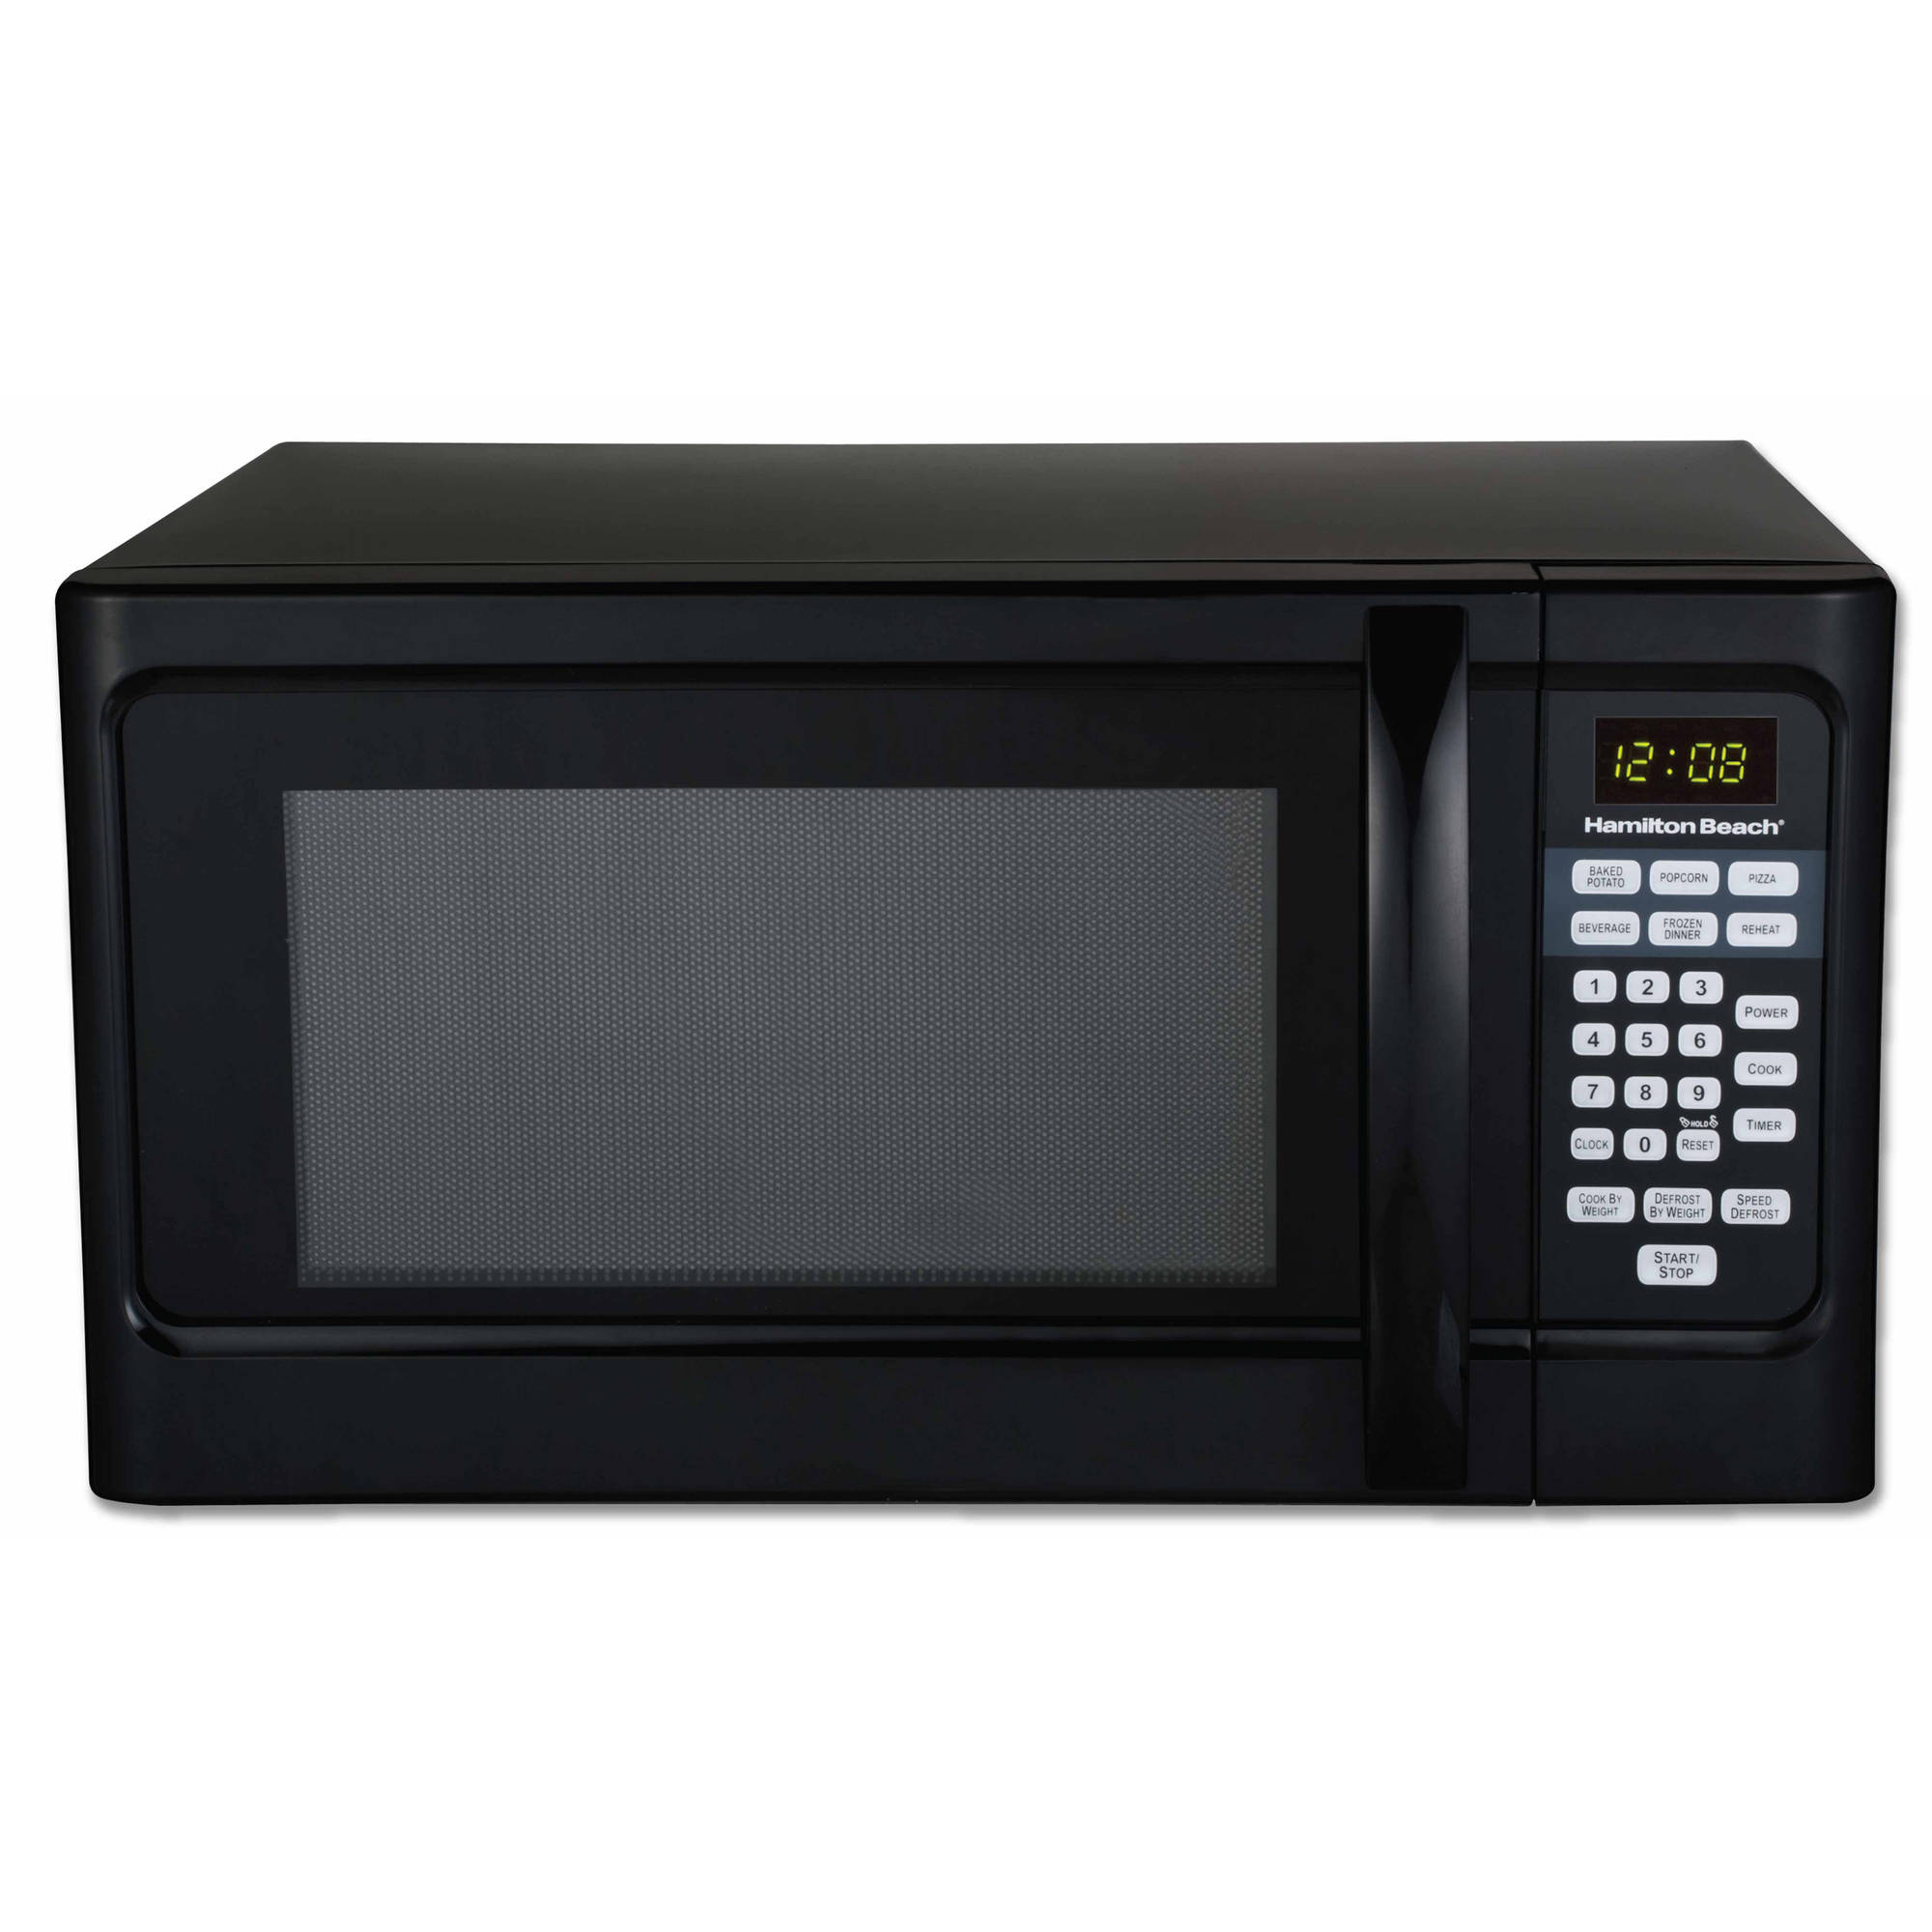 Hamilton Beach 1.1 cu ft Microwave Oven, Black